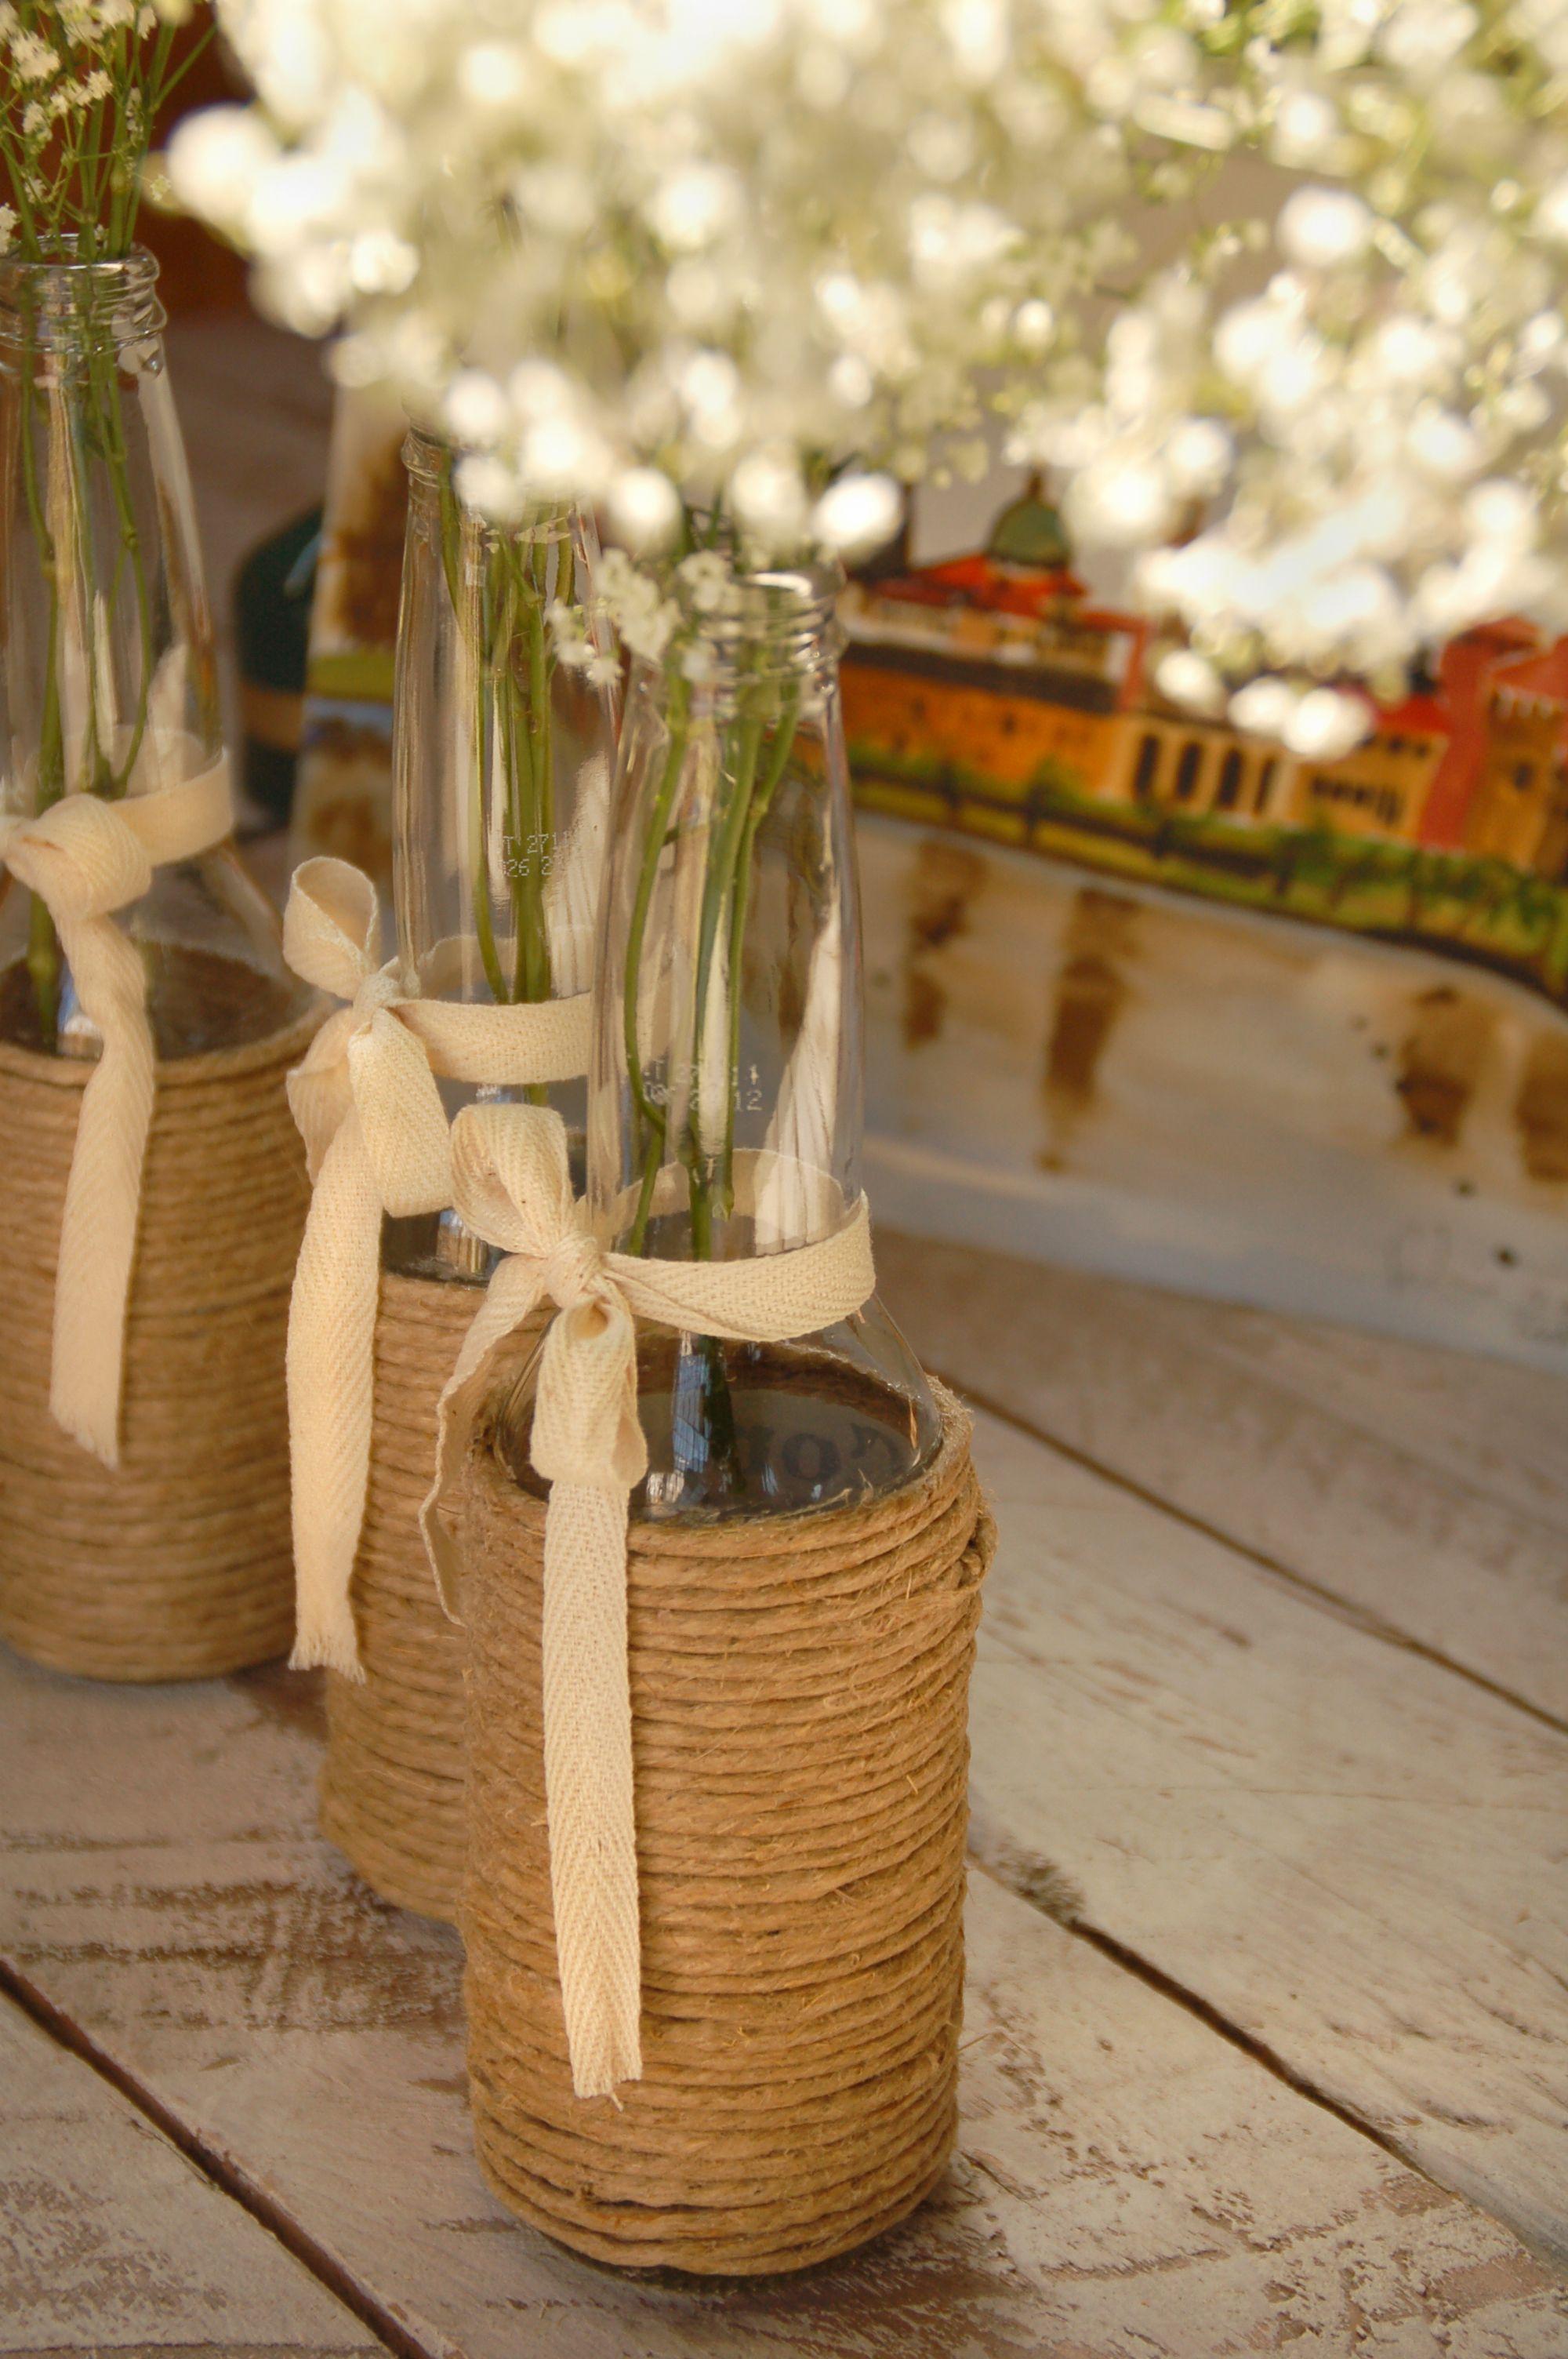 Matrimonio Rustico Umbria : Matrimonio rustico allestimenti di materiali recupero